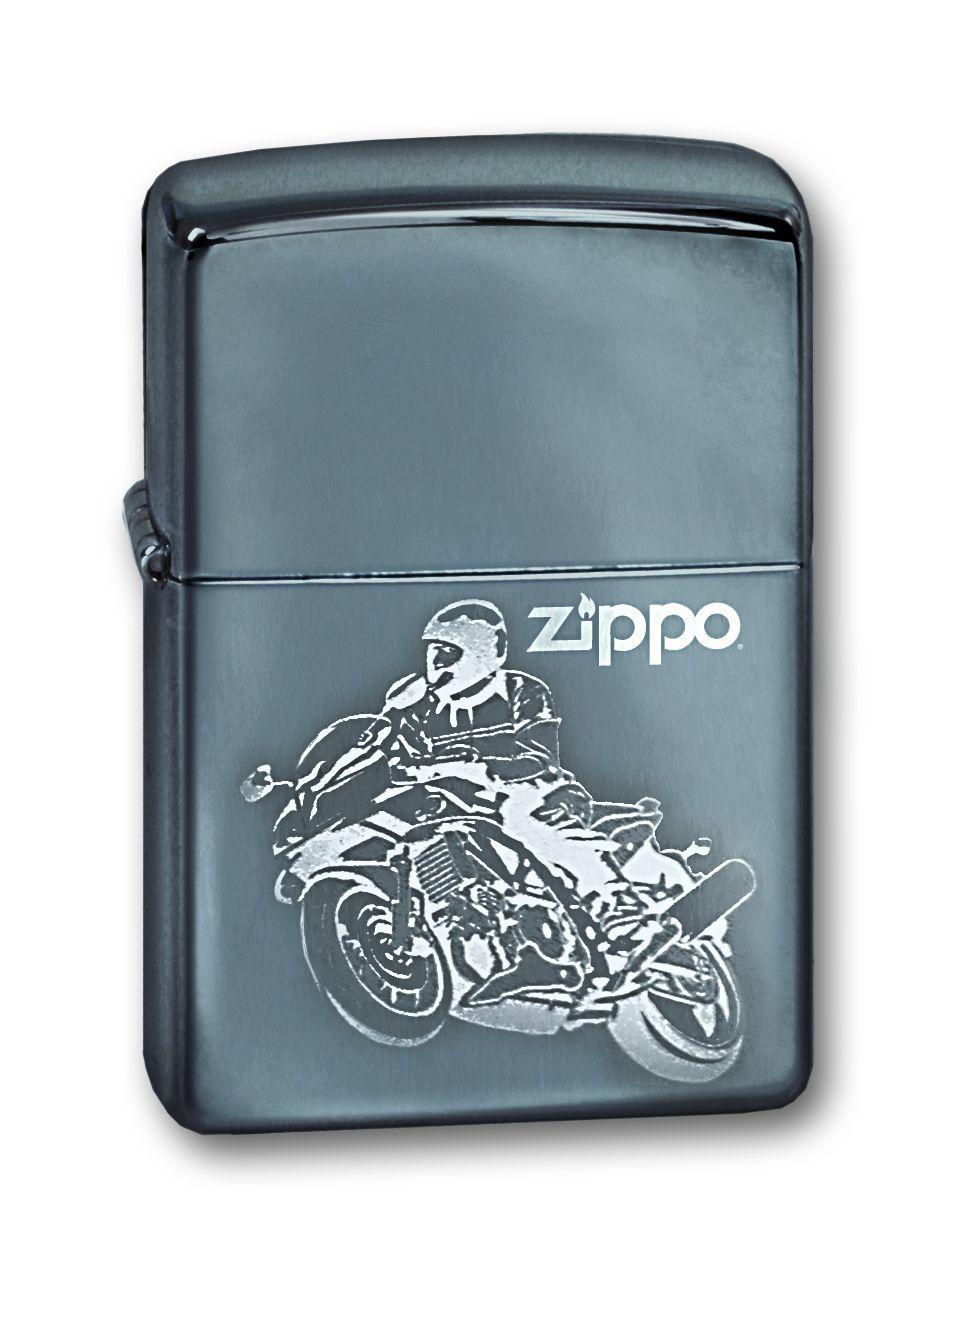 Зажигалка ZIPPO Moto High Polish Chrome, латунь с никеле-хром. покрыт., серебр., глянц., 36х56х12 мм цена